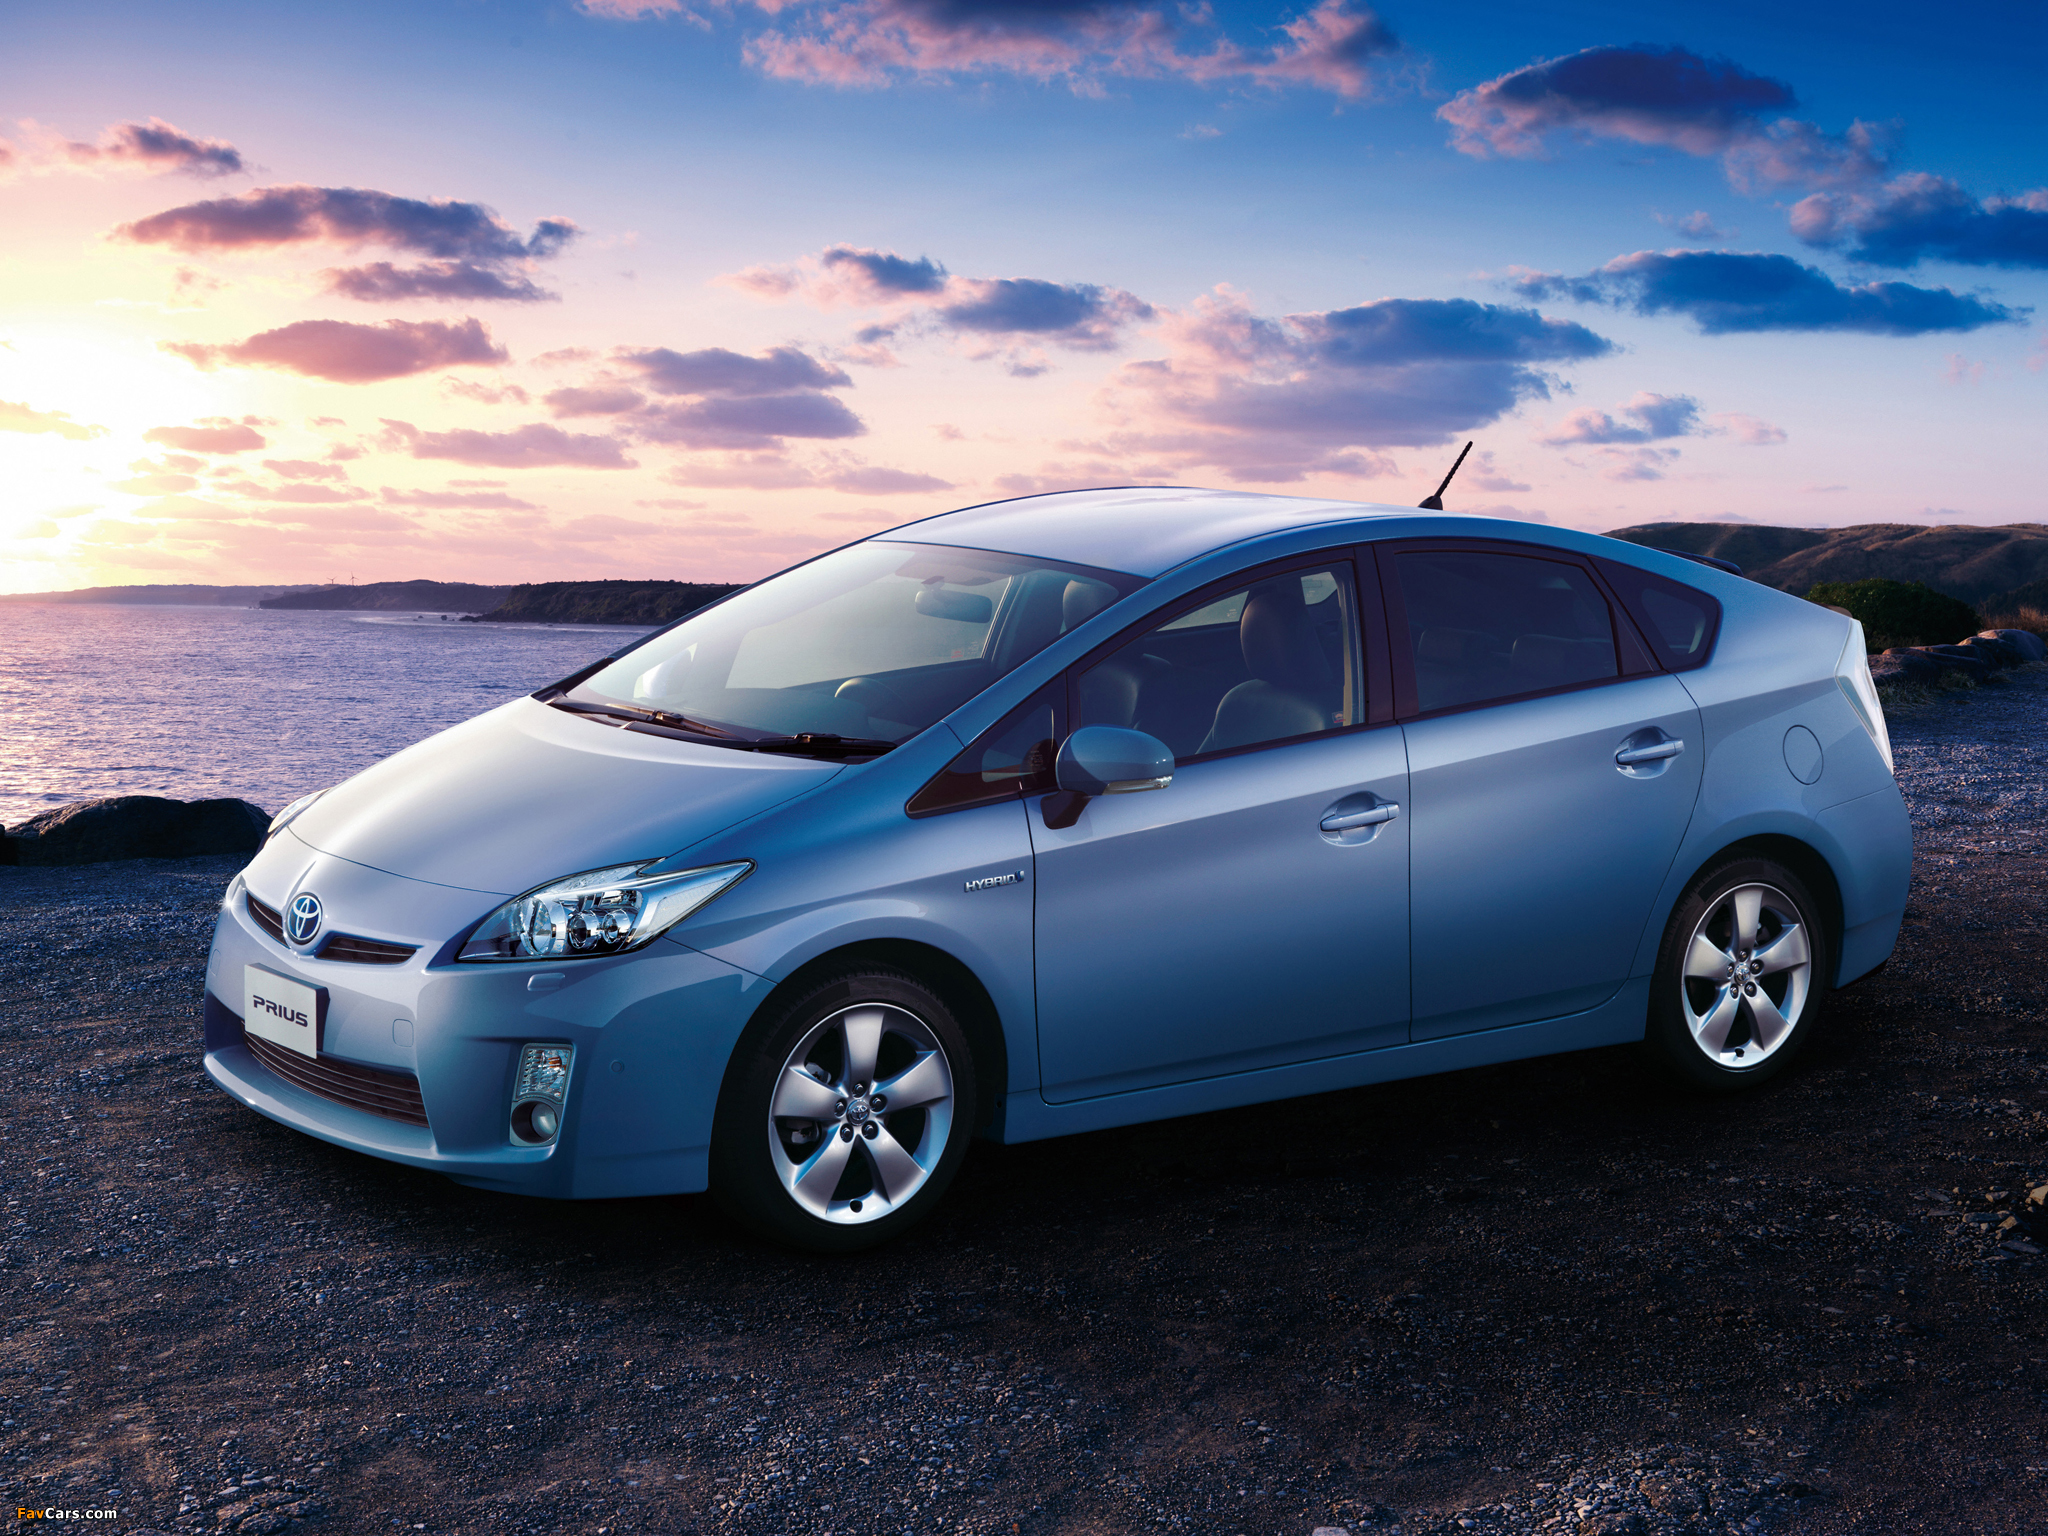 2018 Toyota Prius c Hybrid Hatchback Car | Bring a sense ...